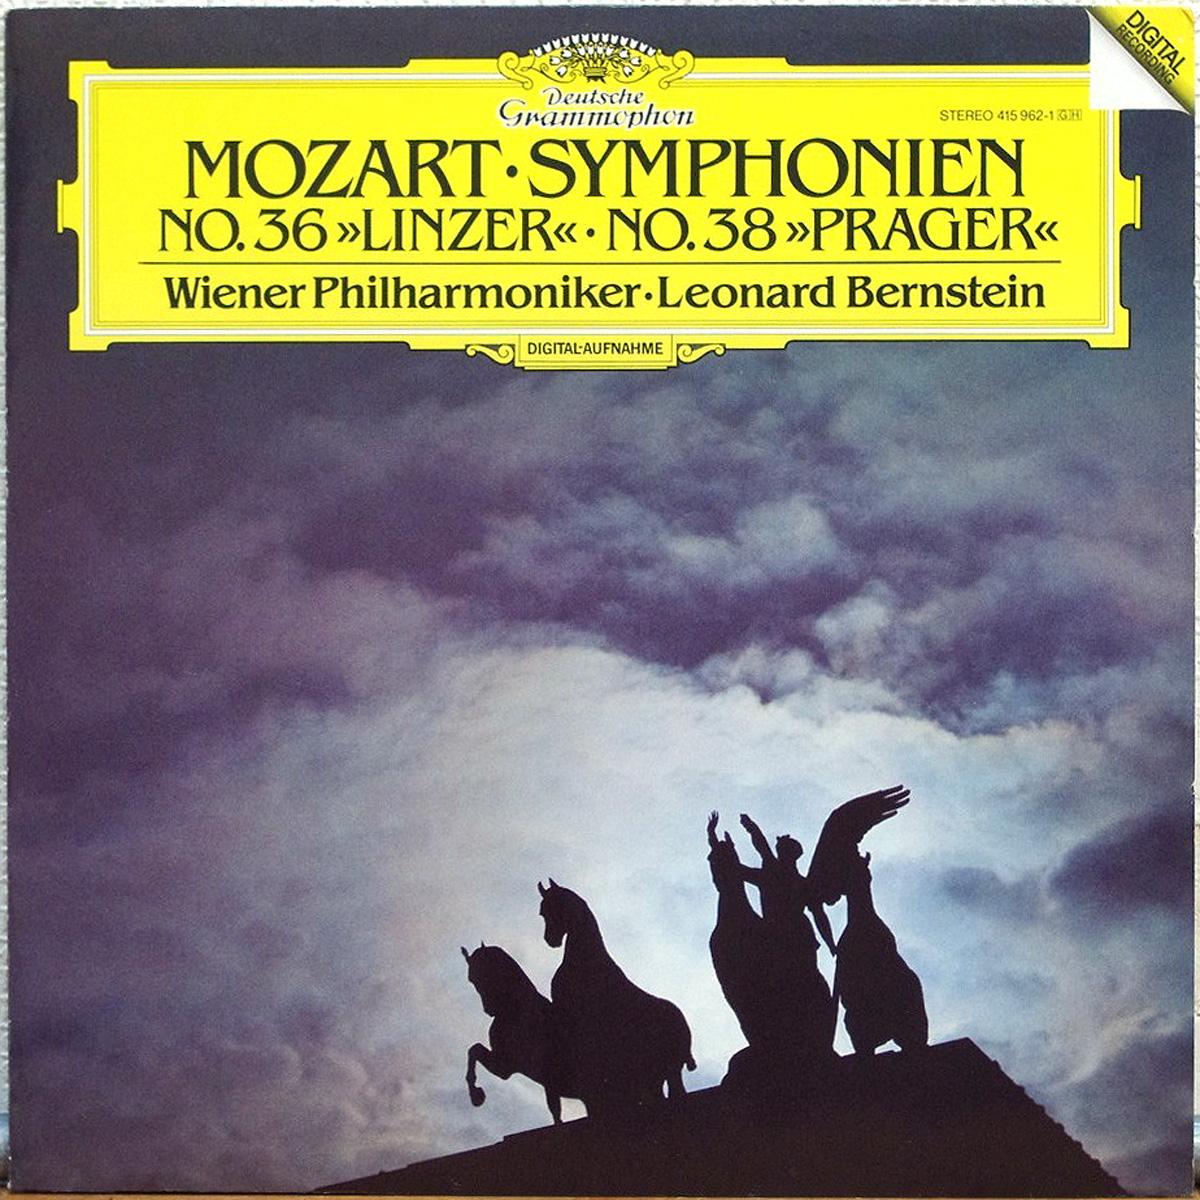 DGG 415 962 Mozart Symphonies 36 38 Bernstein DGG Digital Aufnahme